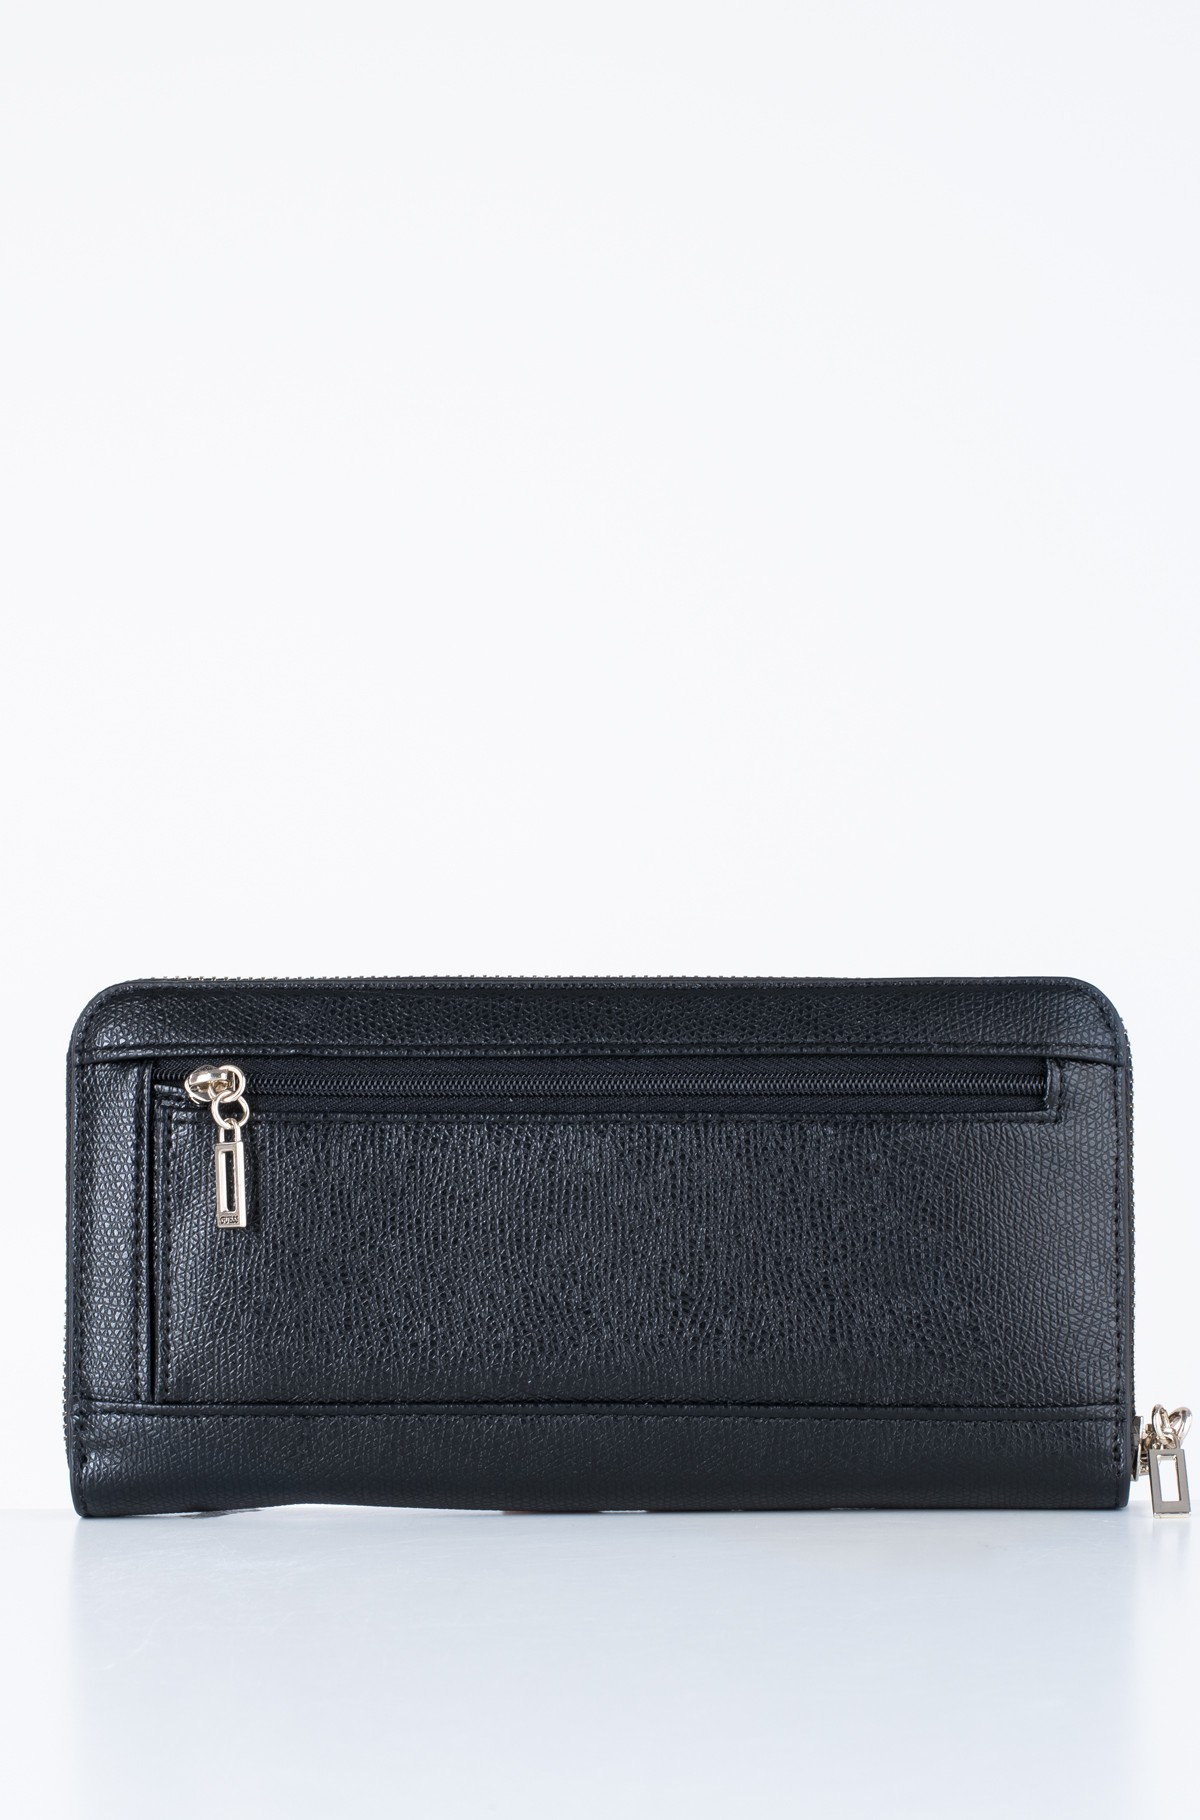 Wallet SWVG71 86460-full-2